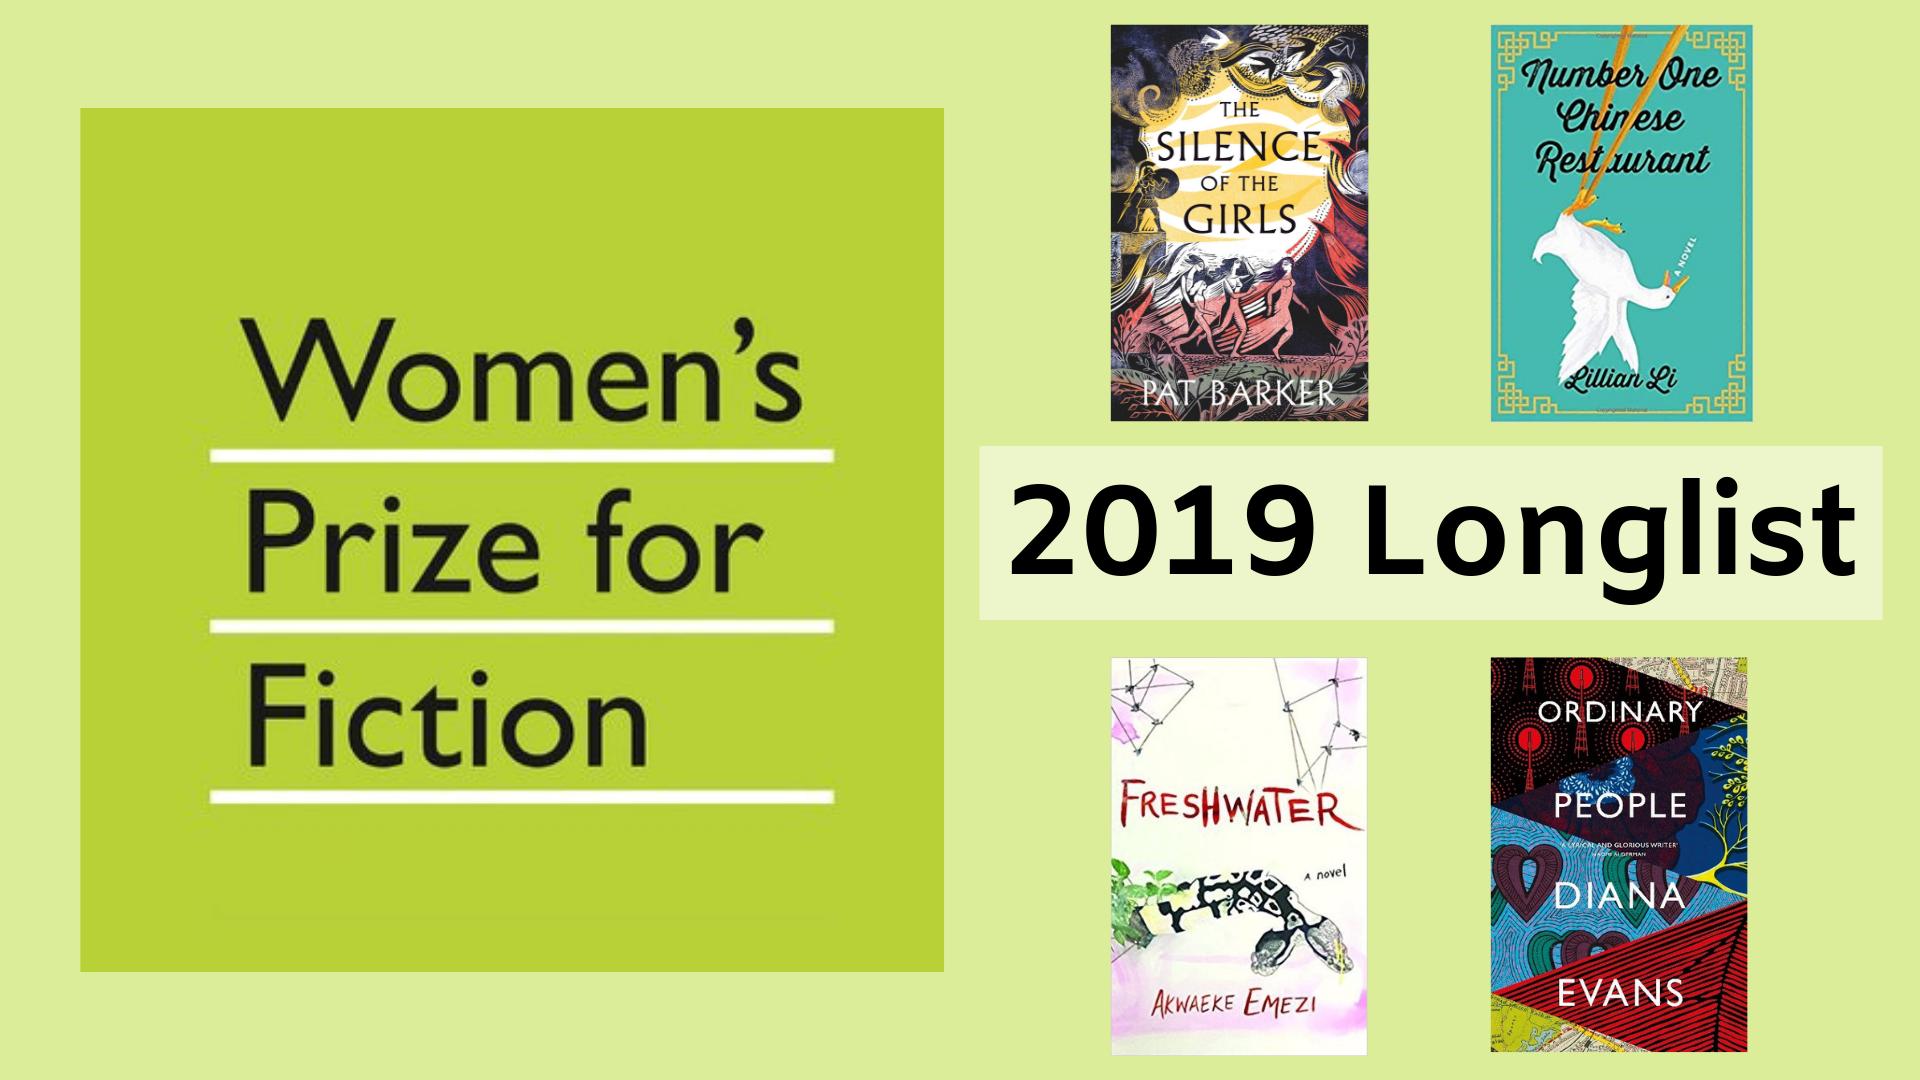 Woman's Prize for Fiction 2019 Longlist Announced thumbnail image.